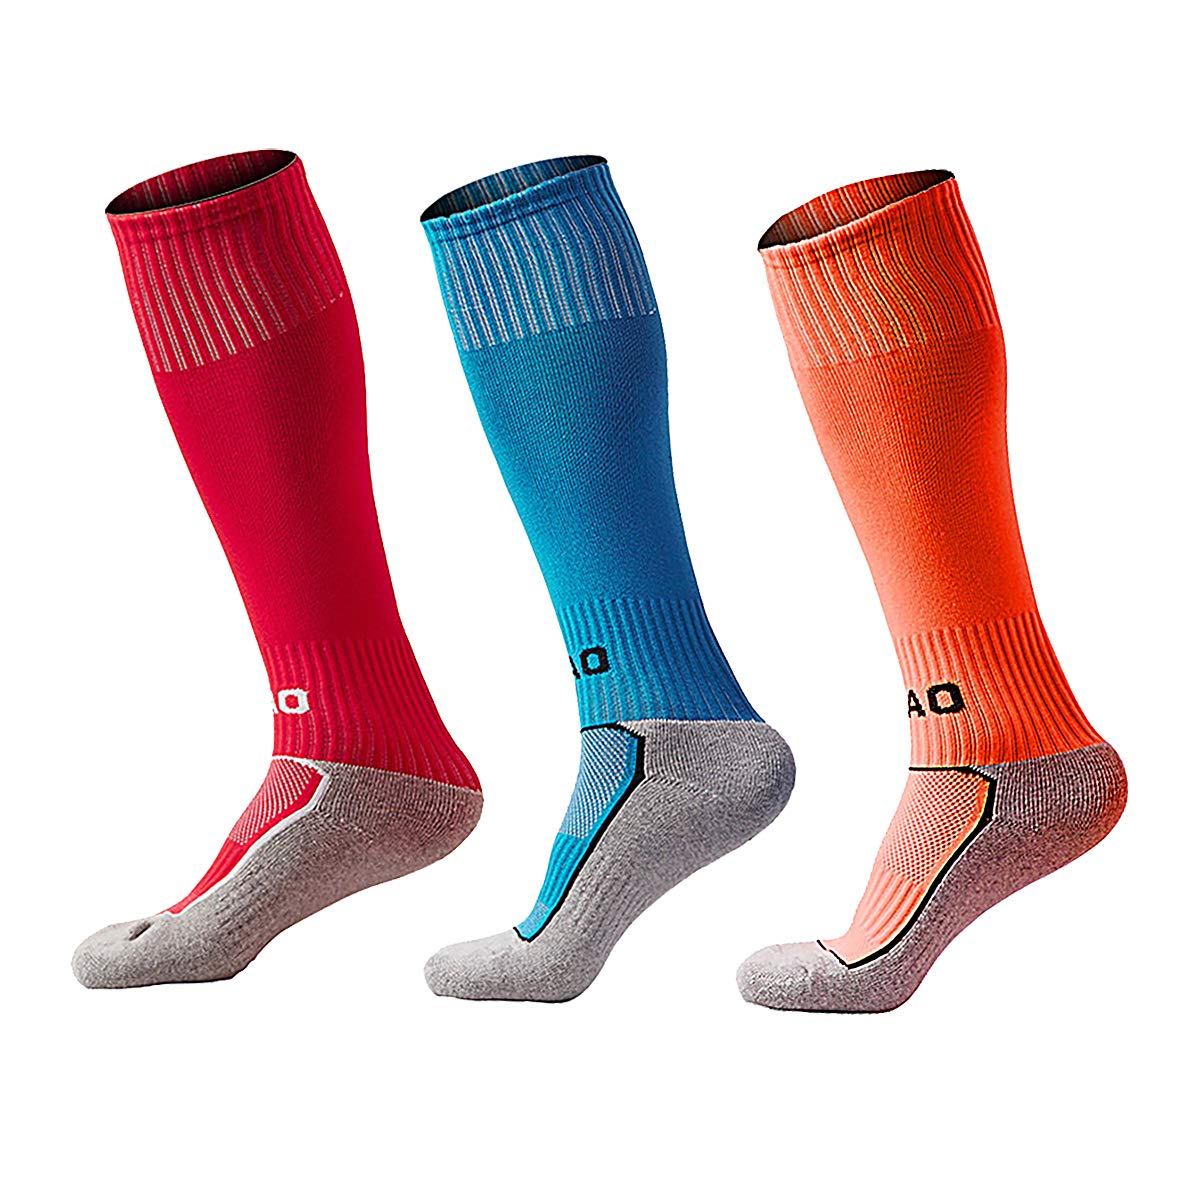 Kids Soccer Socks Knee High Tube Socks Towel Bottom Pressure Football Socks 3 Pack/1 Pack(7-13 Years Little Kid/Big Kid)